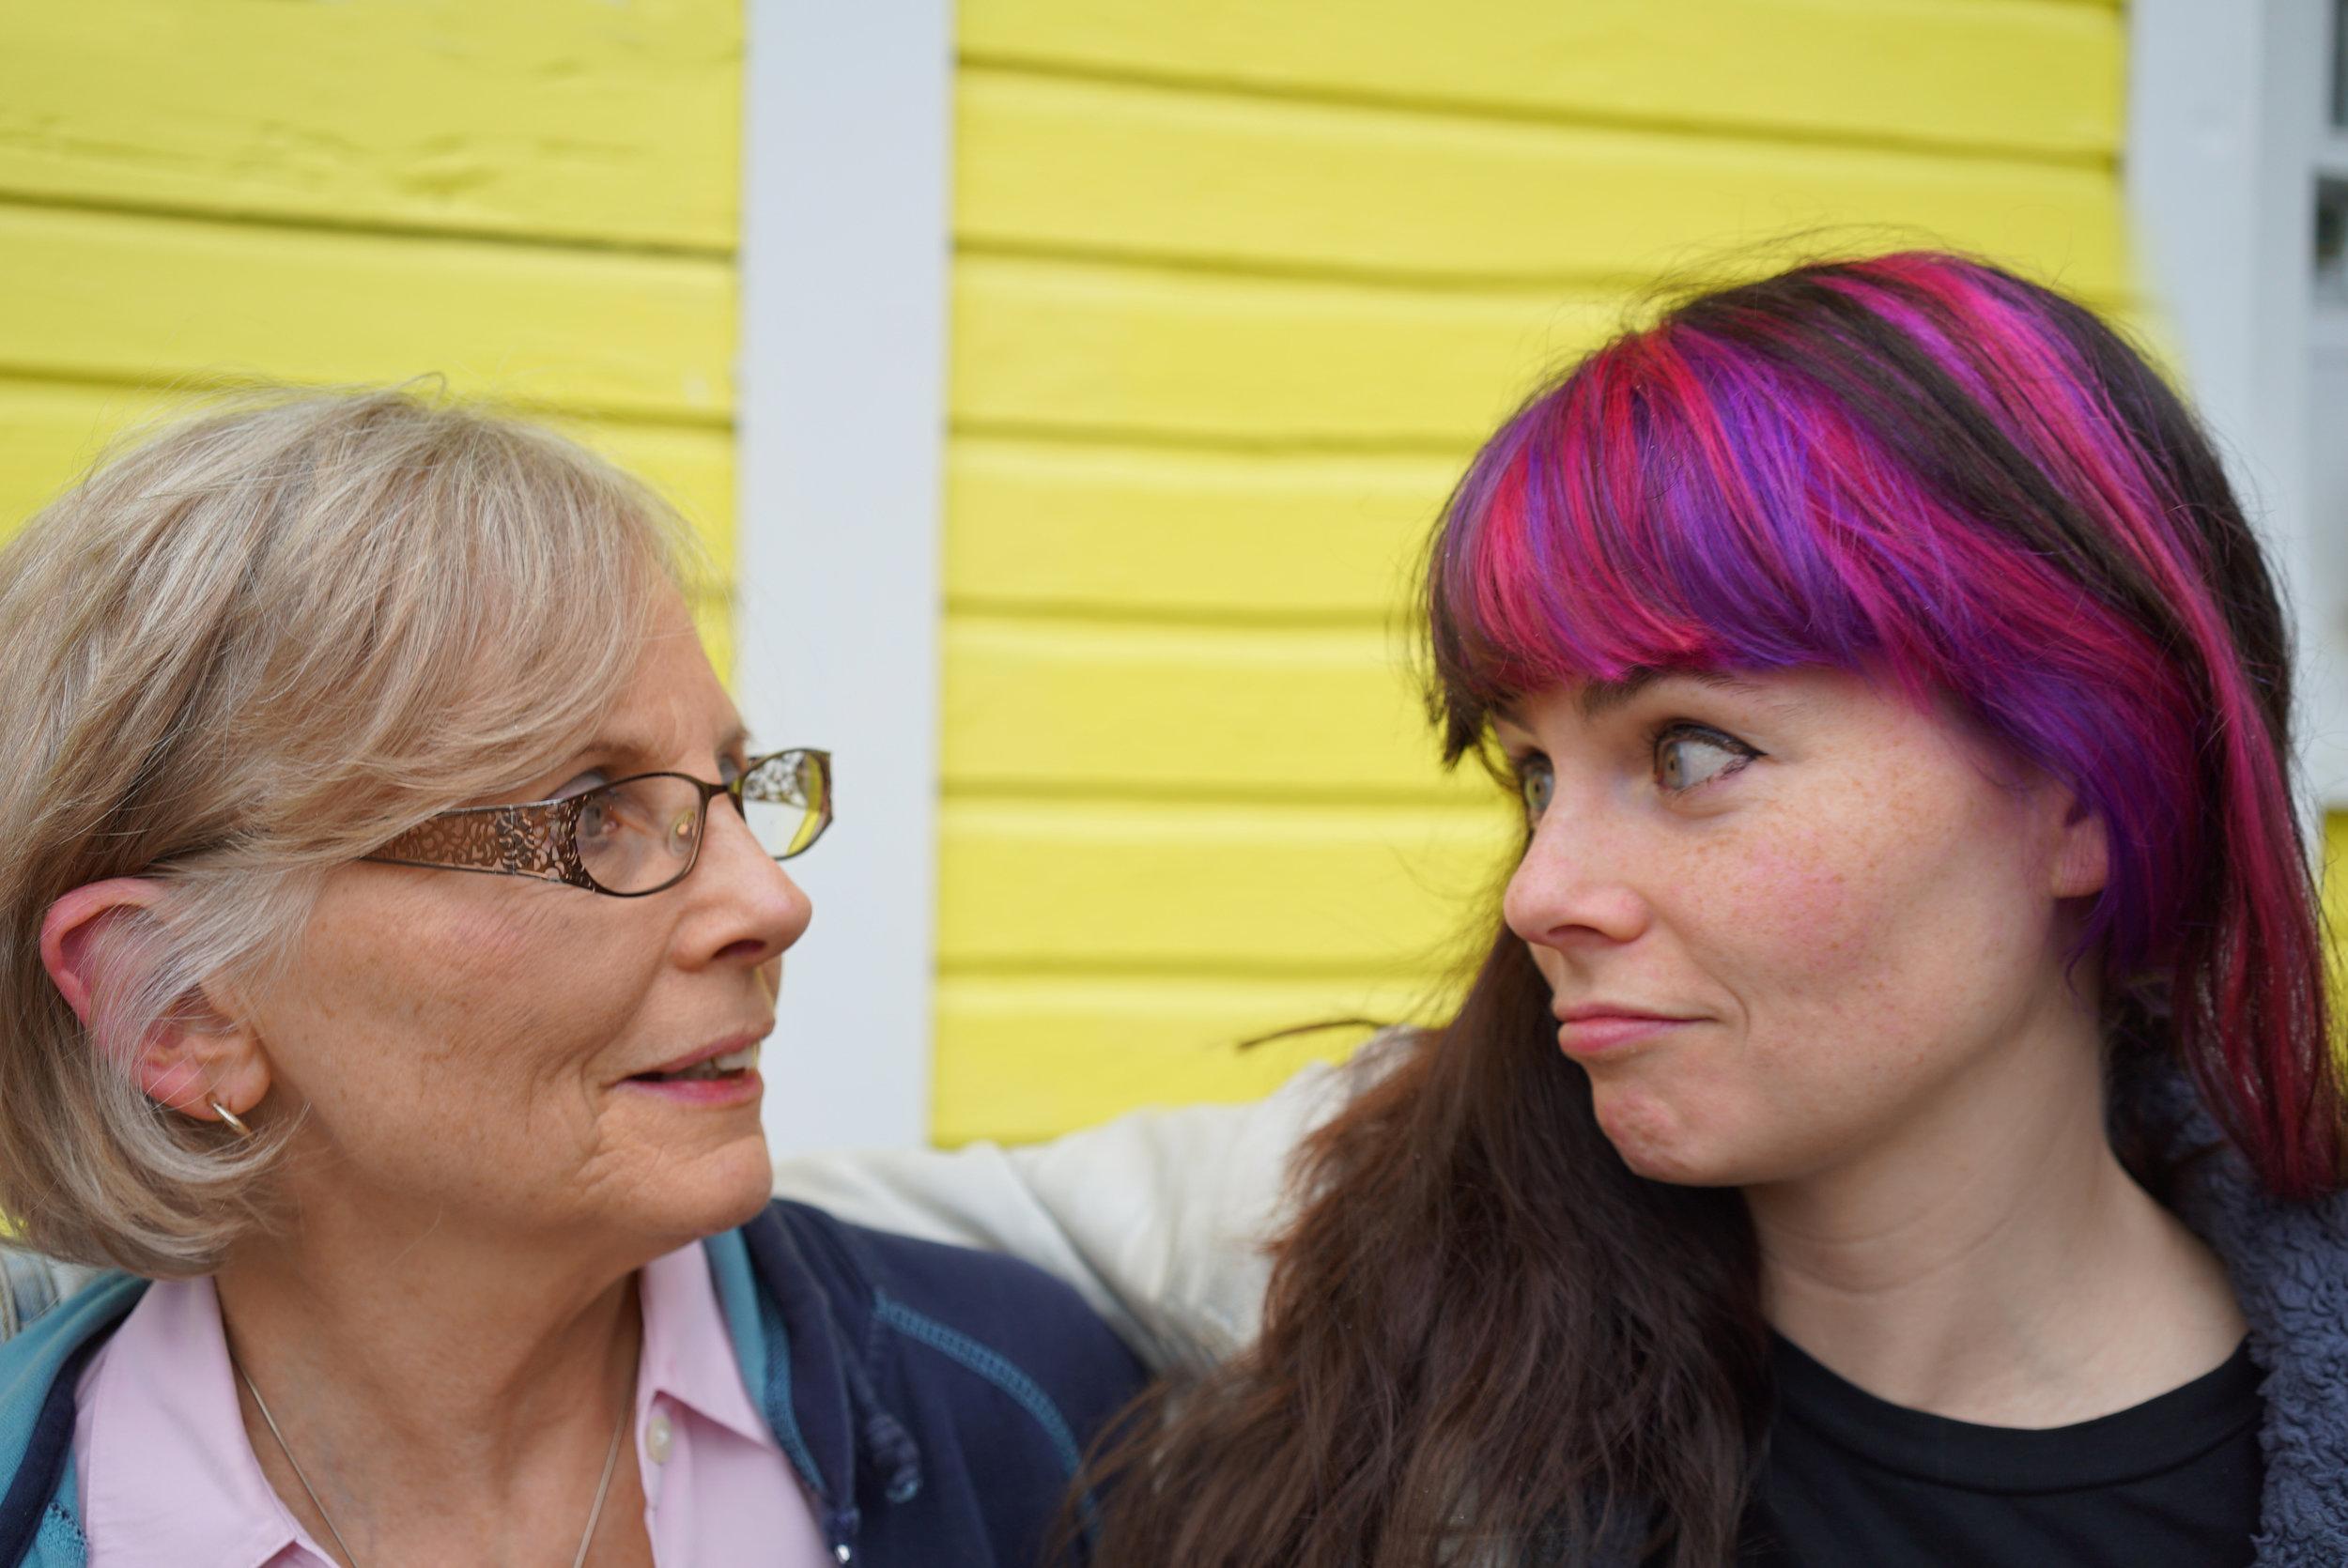 Momma B & Rebecca giving the looks.